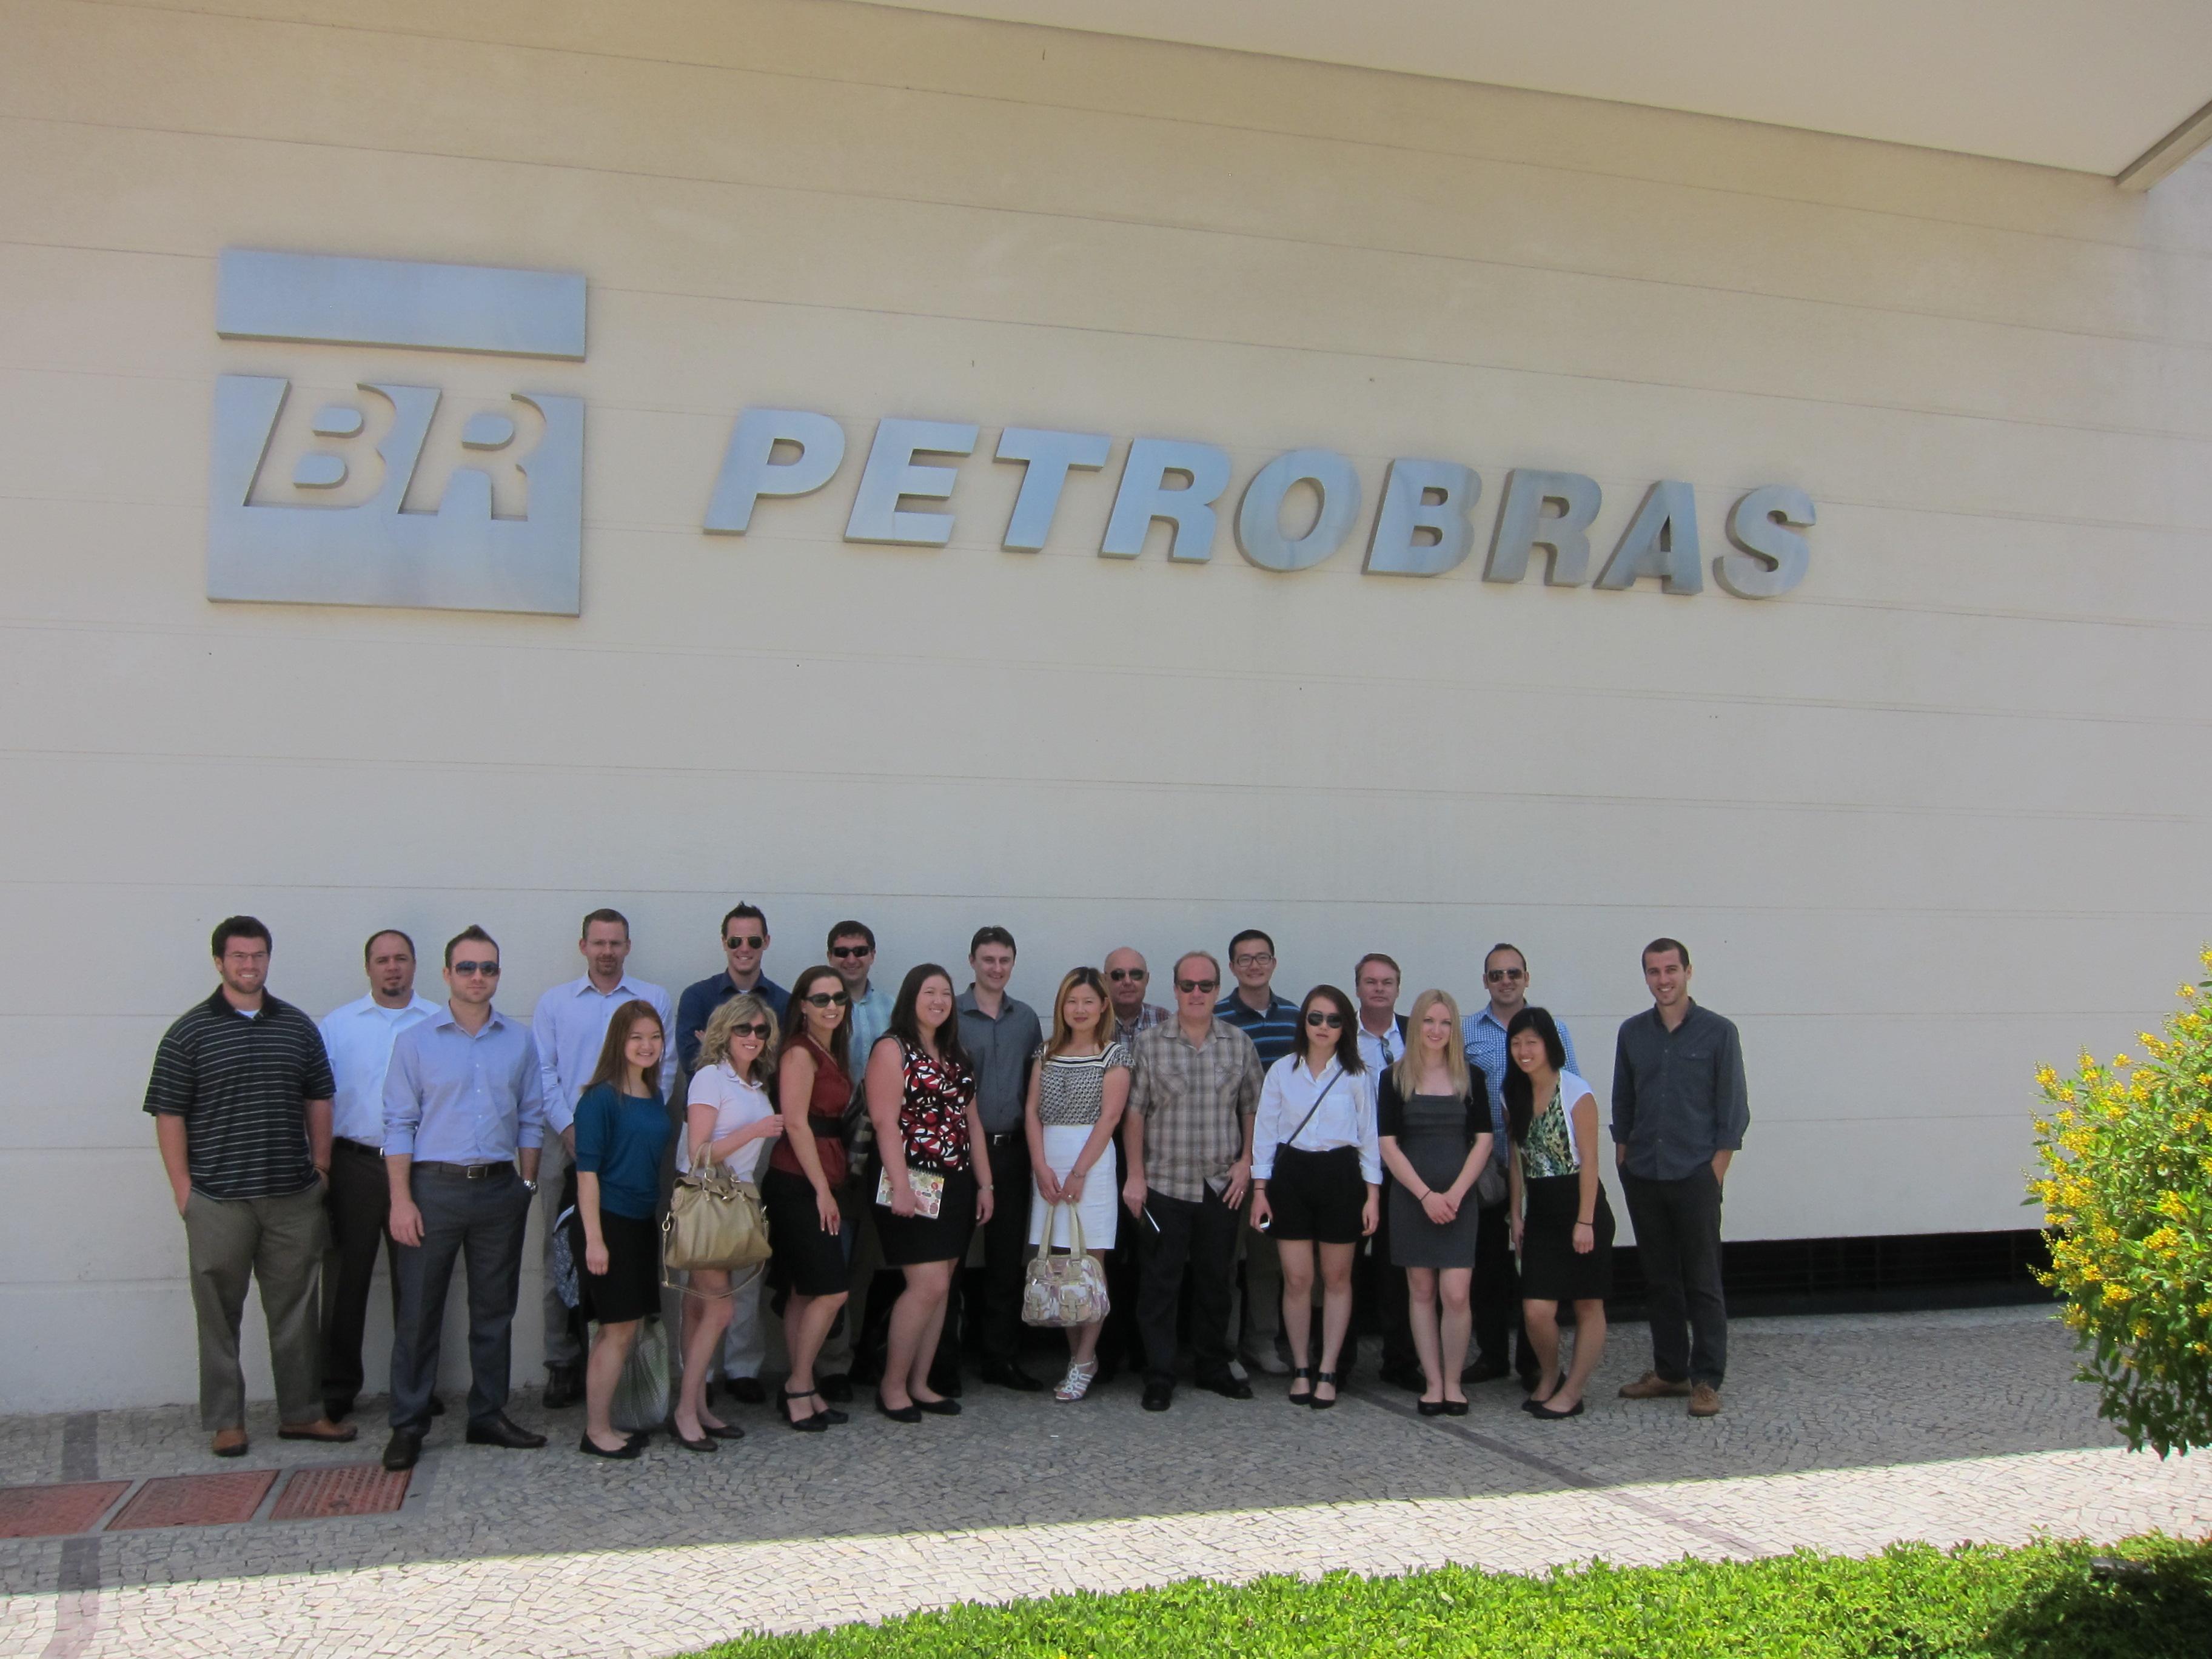 Petrobras Group Shot